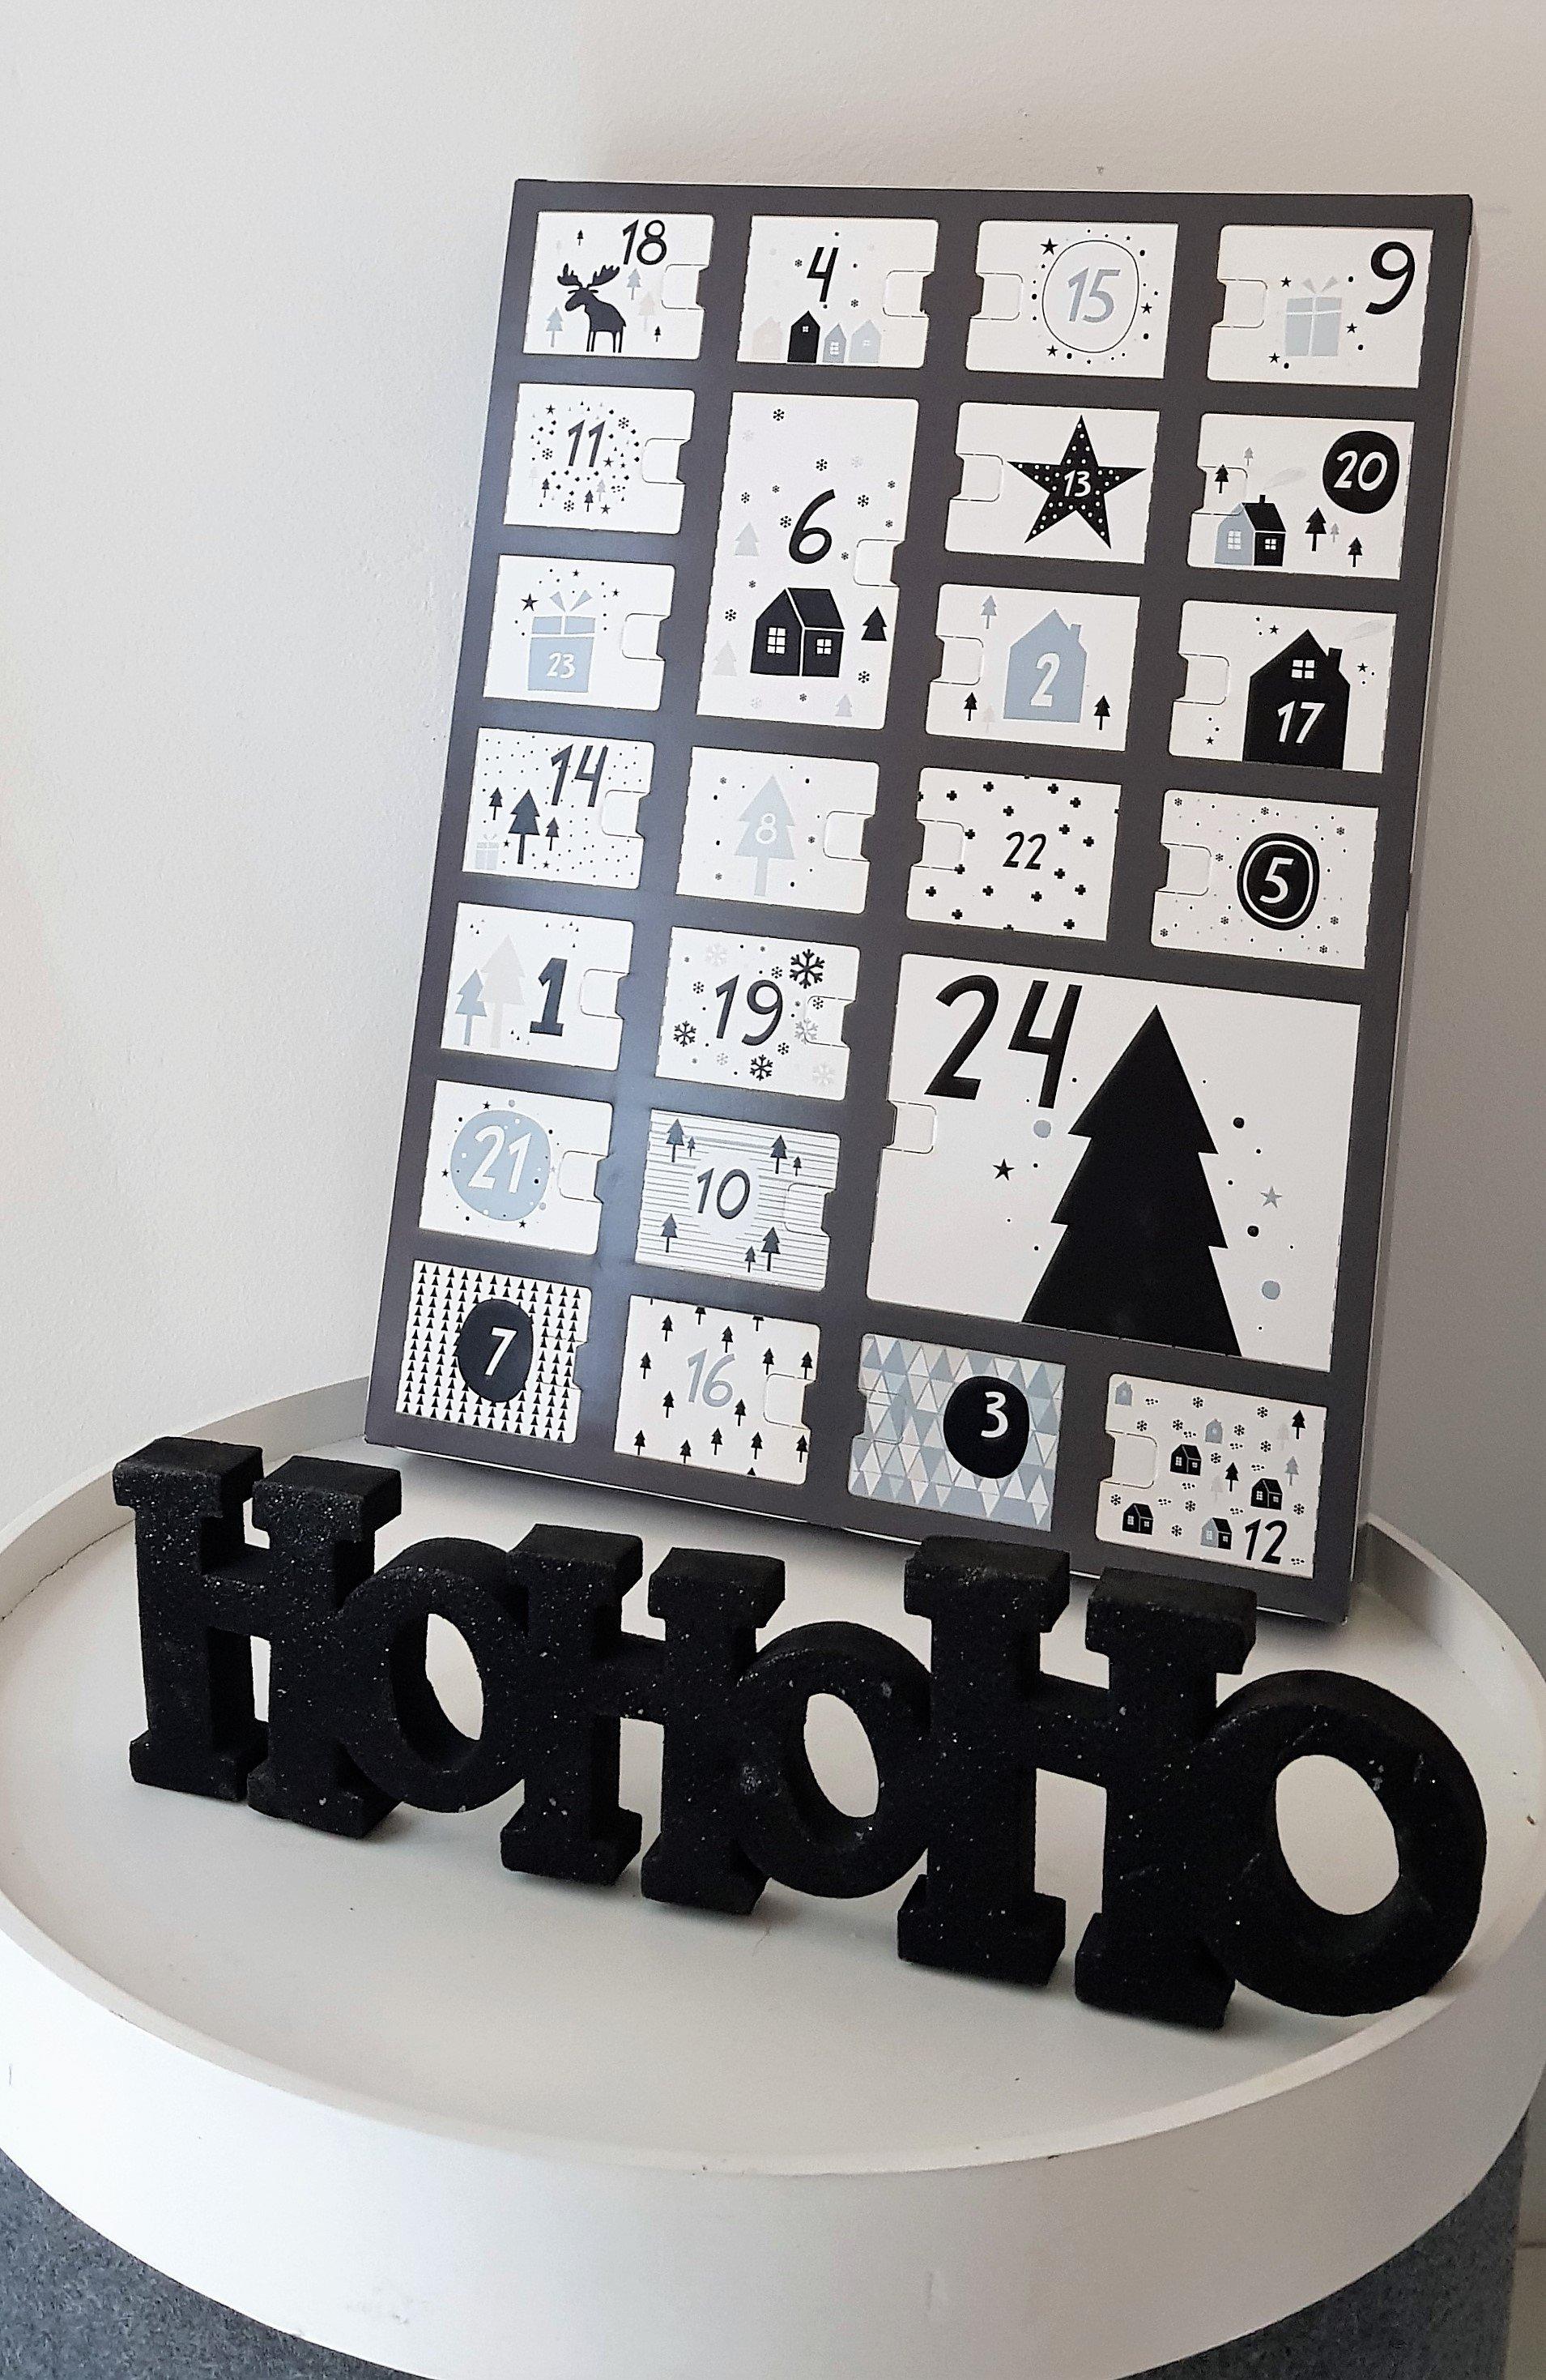 metterschlingundmaulwurfn_diy_adventskalender_selbstgemalt_befüllbar_selbermachen_geschenkidee_kalender_designyourpackaging (1)